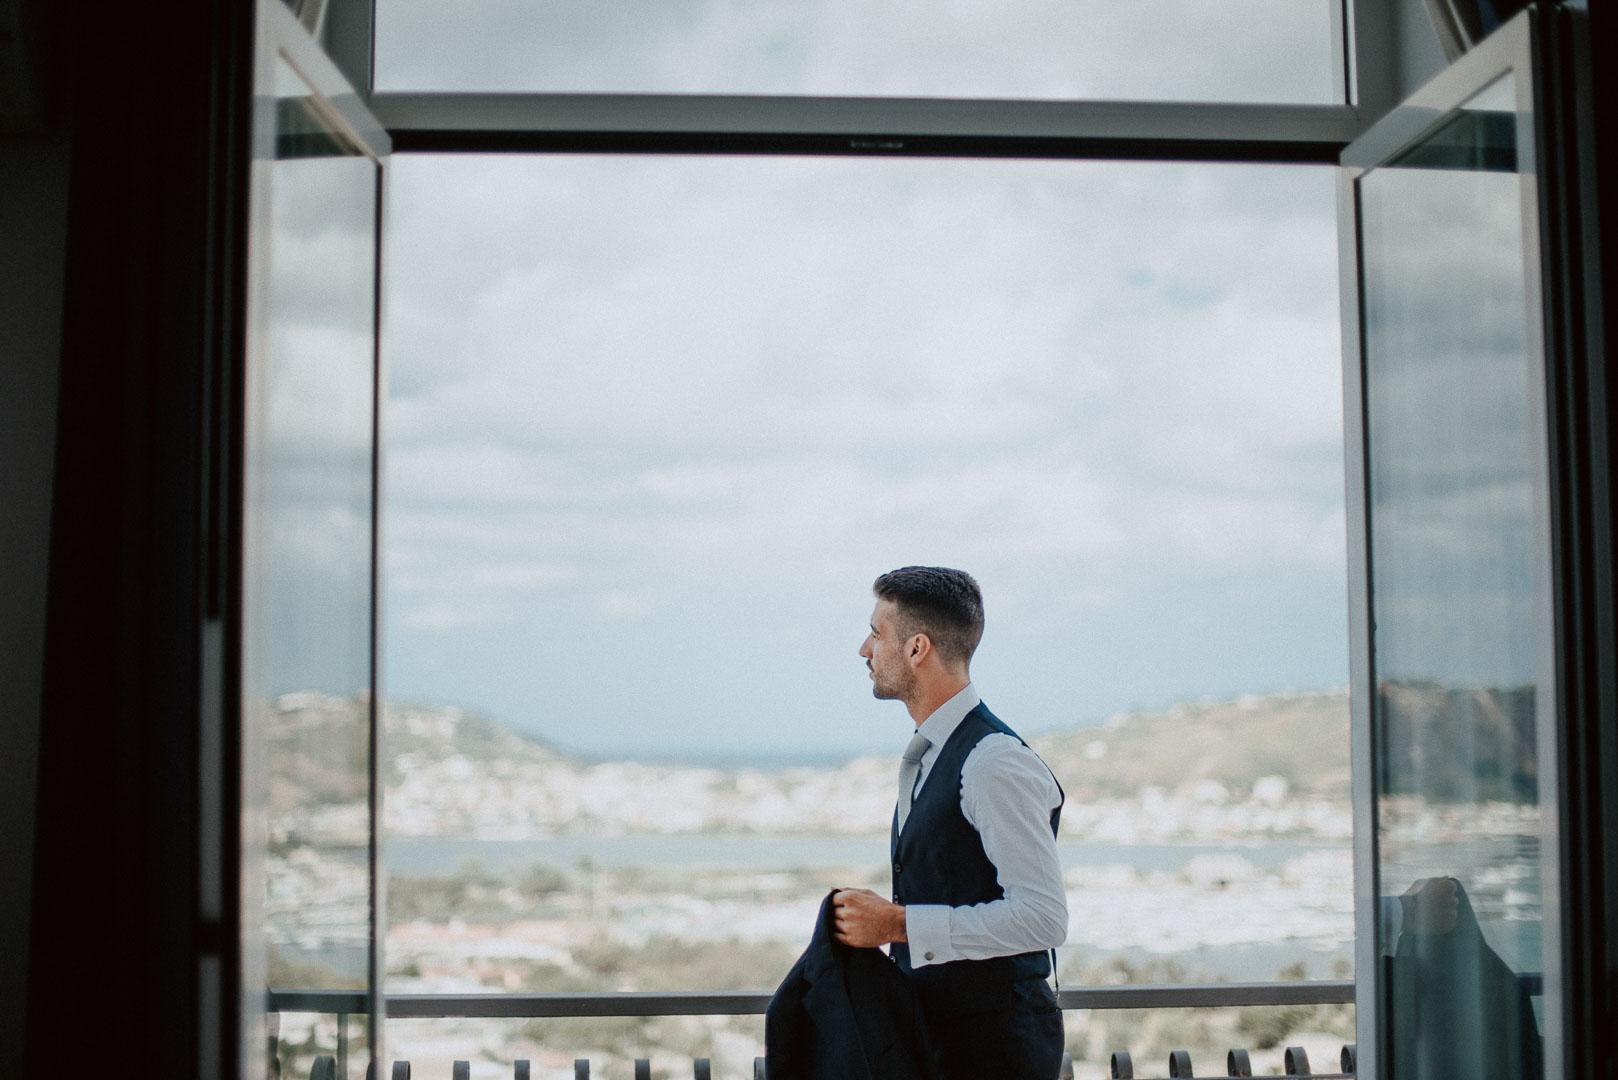 wedding-photographer-destination-fineart-bespoke-reportage-napoli-nabilah-vivianeizzo-spazio46-13